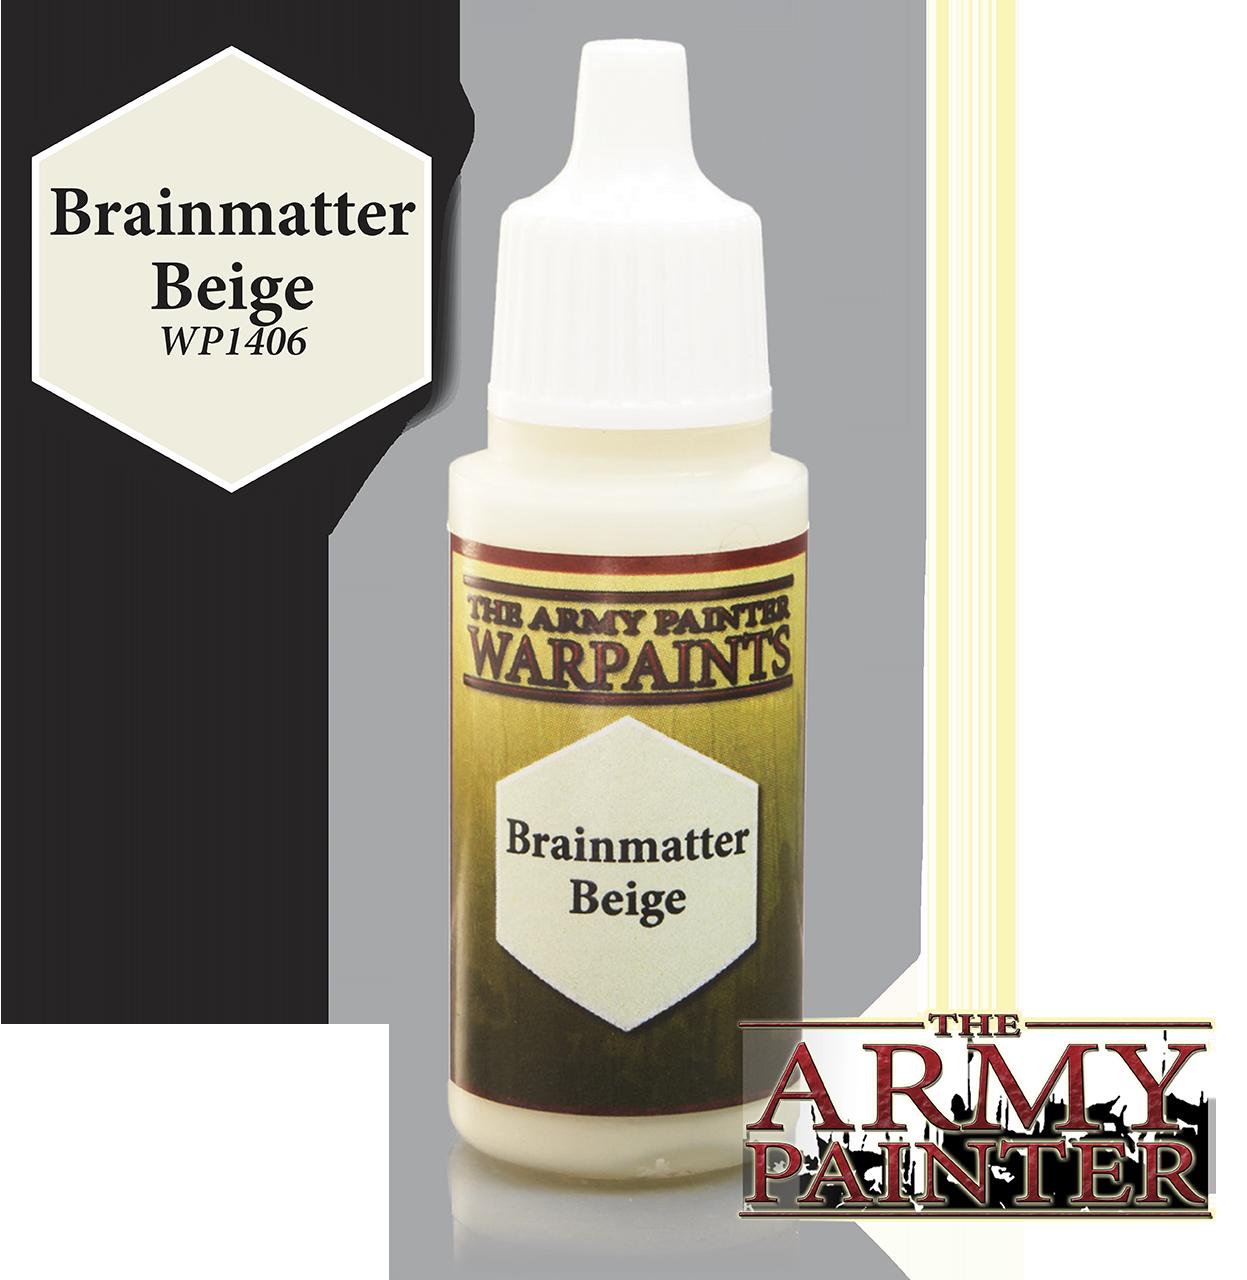 Brainmatter Beige - Army Painter Warpaints